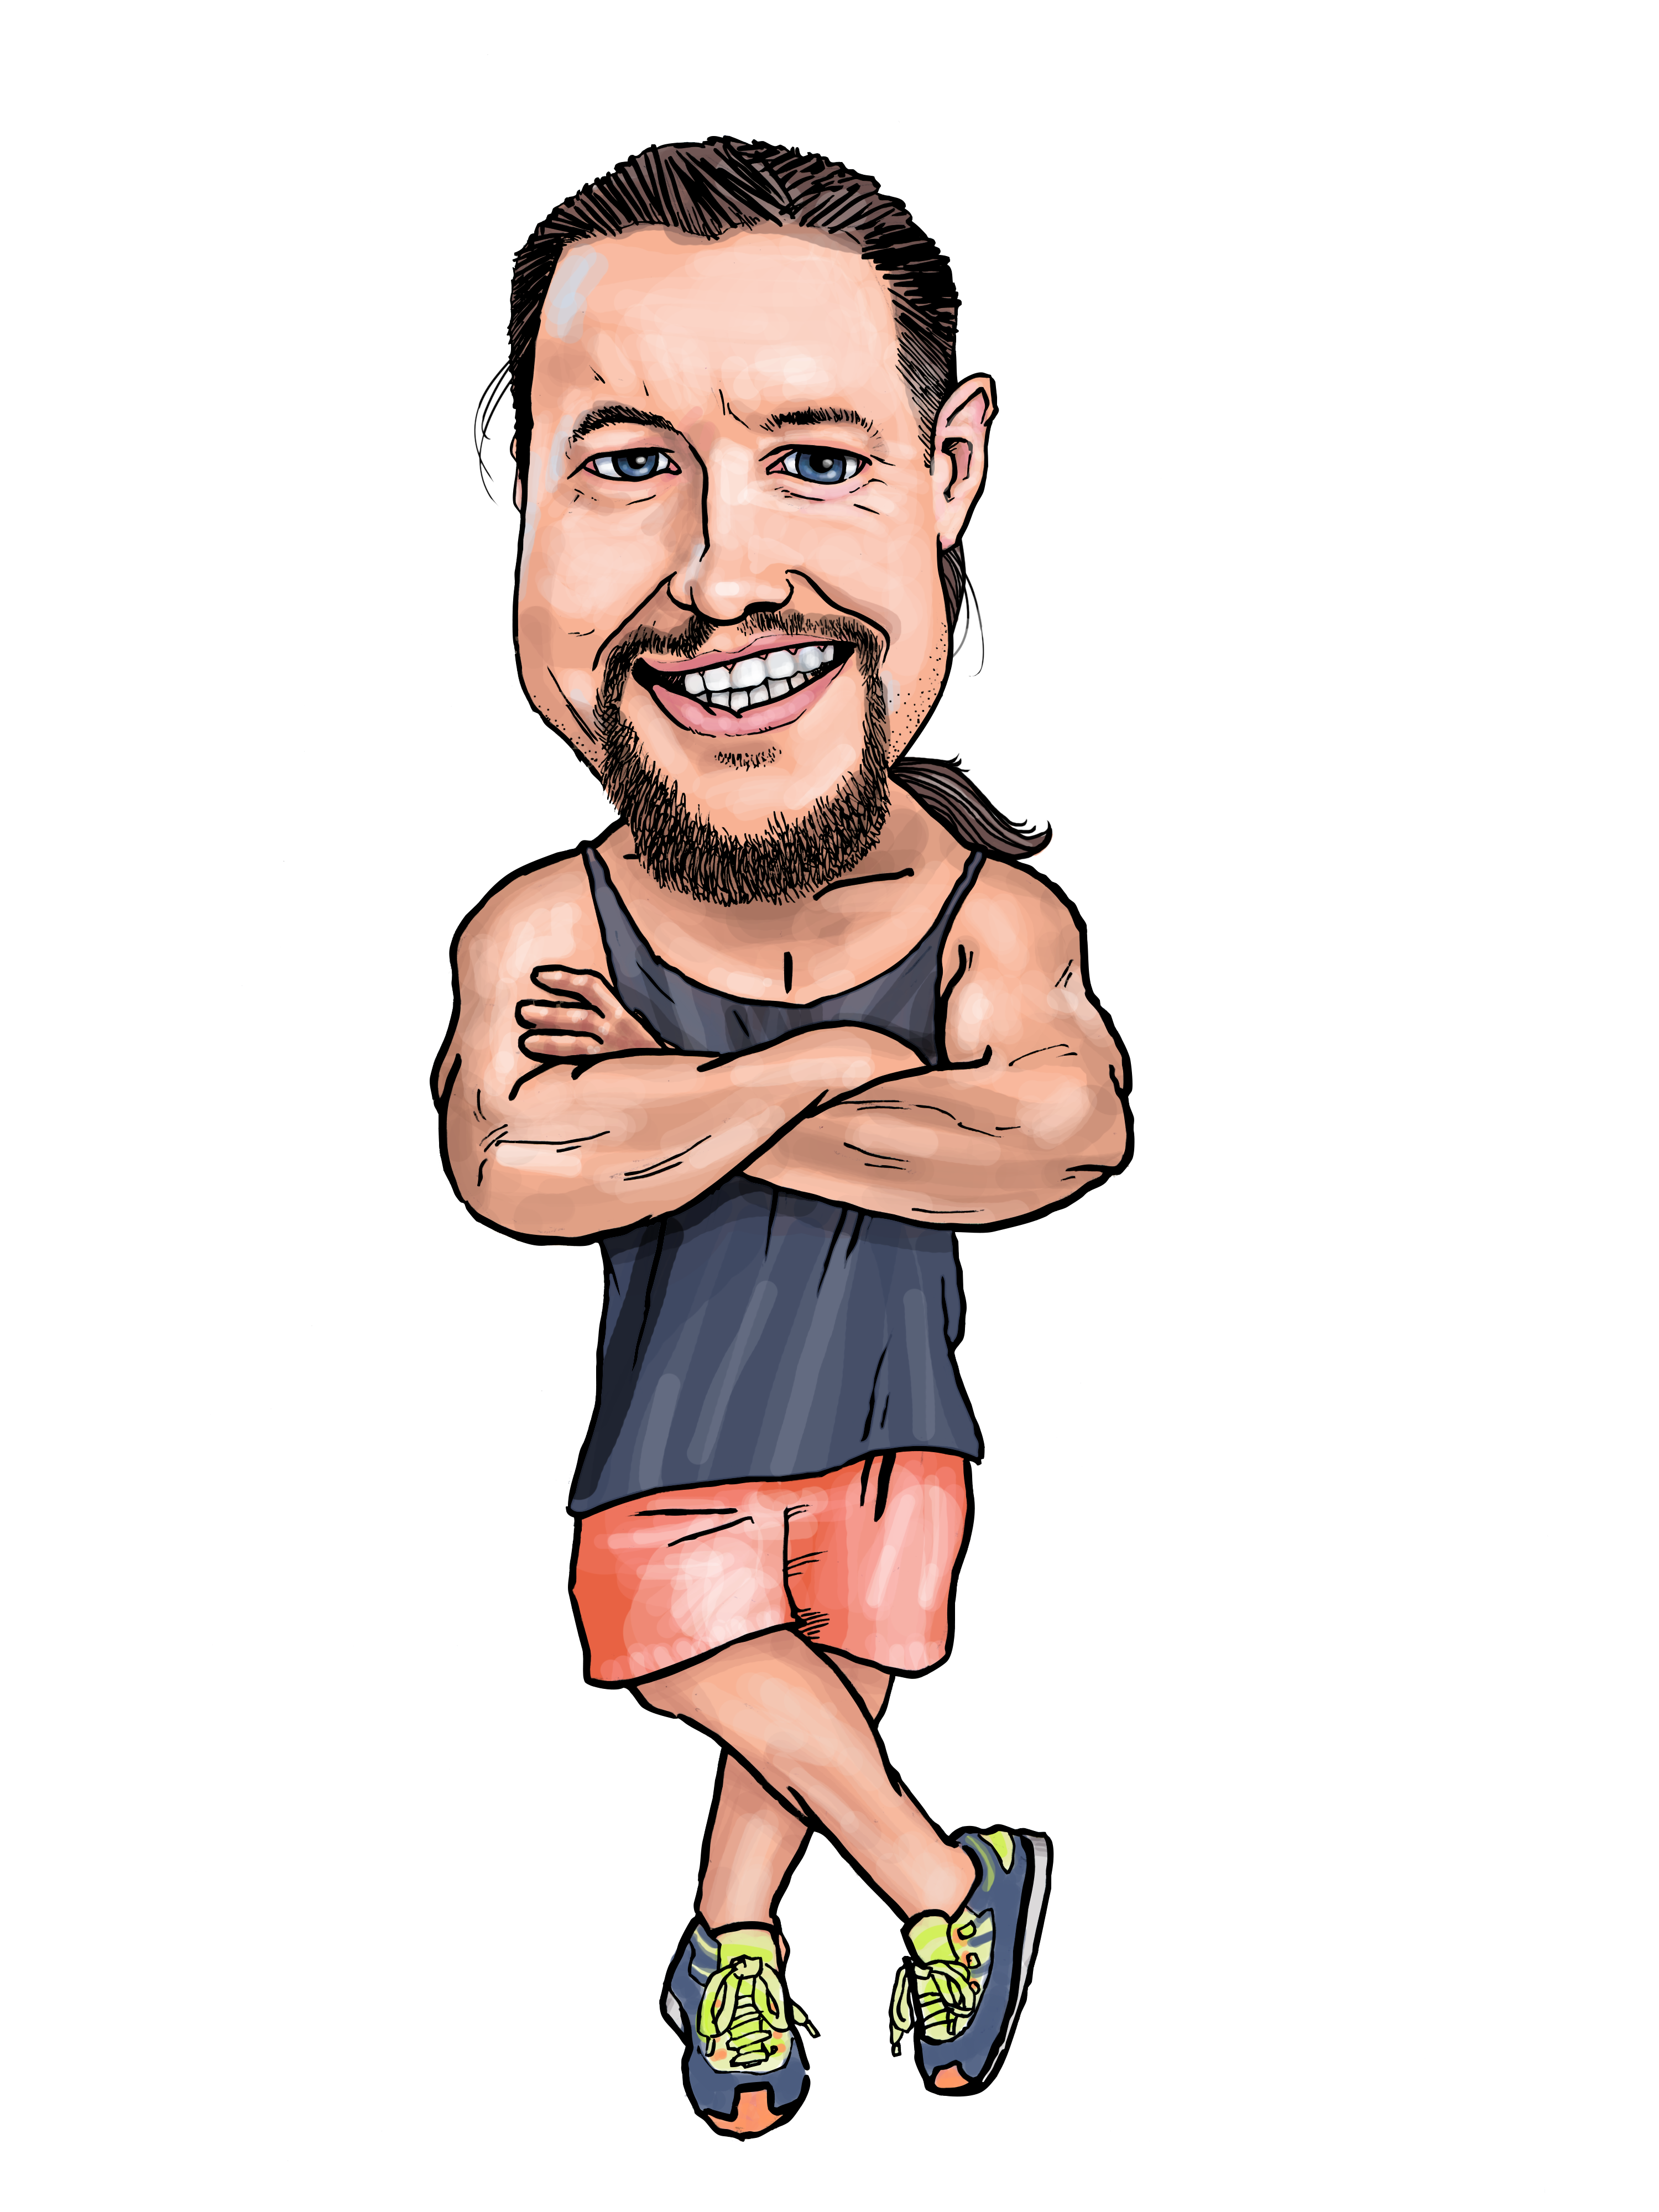 Full Figure Fiverr Caricature by Protoguy on DeviantArt.